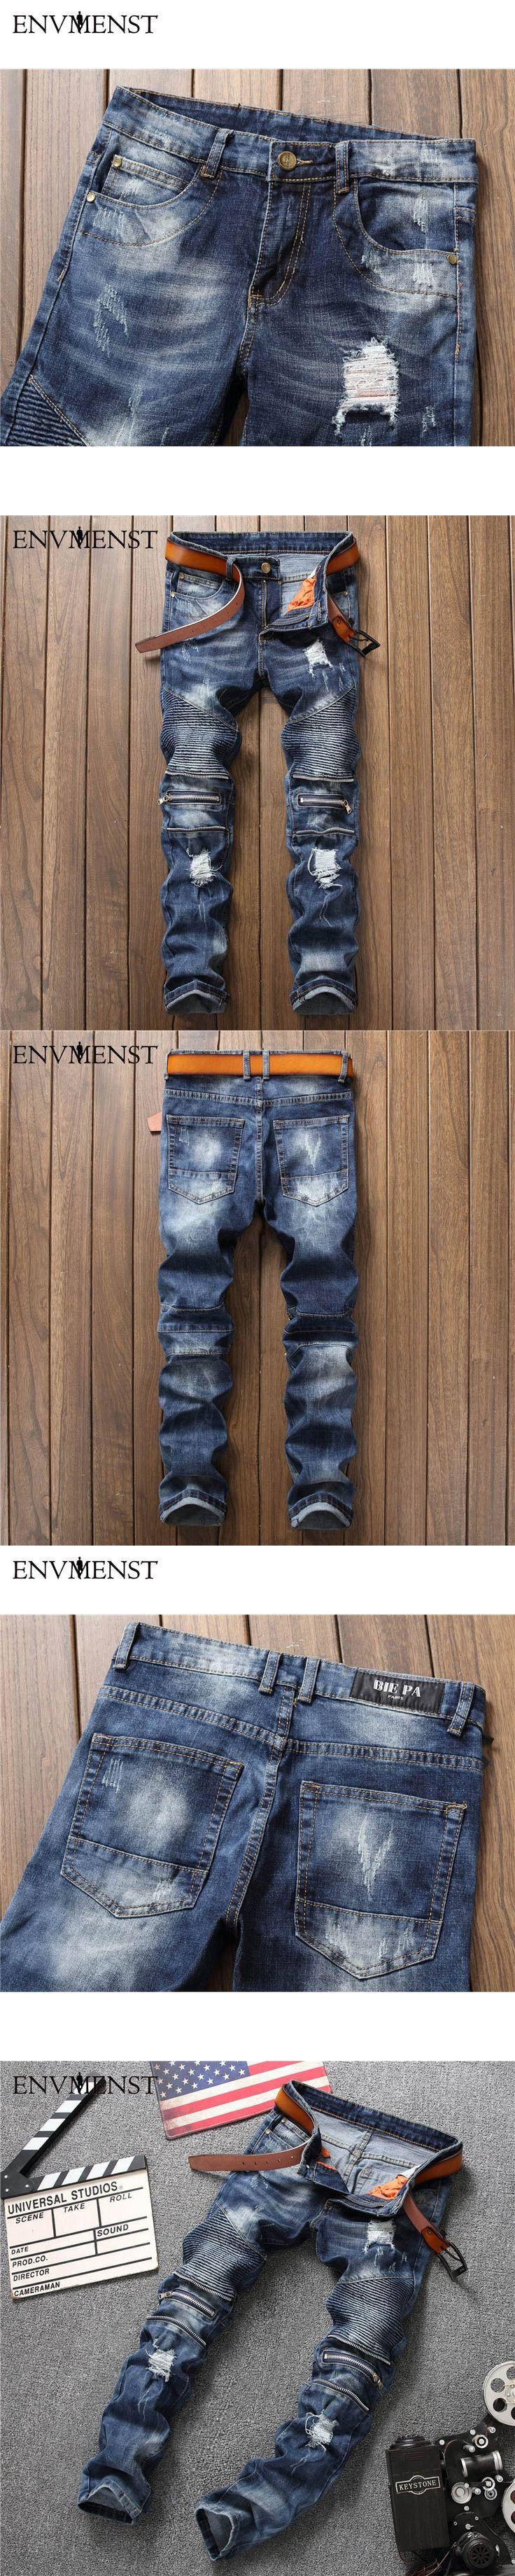 New Biker Men's Zipper Jeans Men Slim Fit Straight Moto Punk Dark Long Designer Pants Nightclubs Men's Jeans Pleated Black Pants